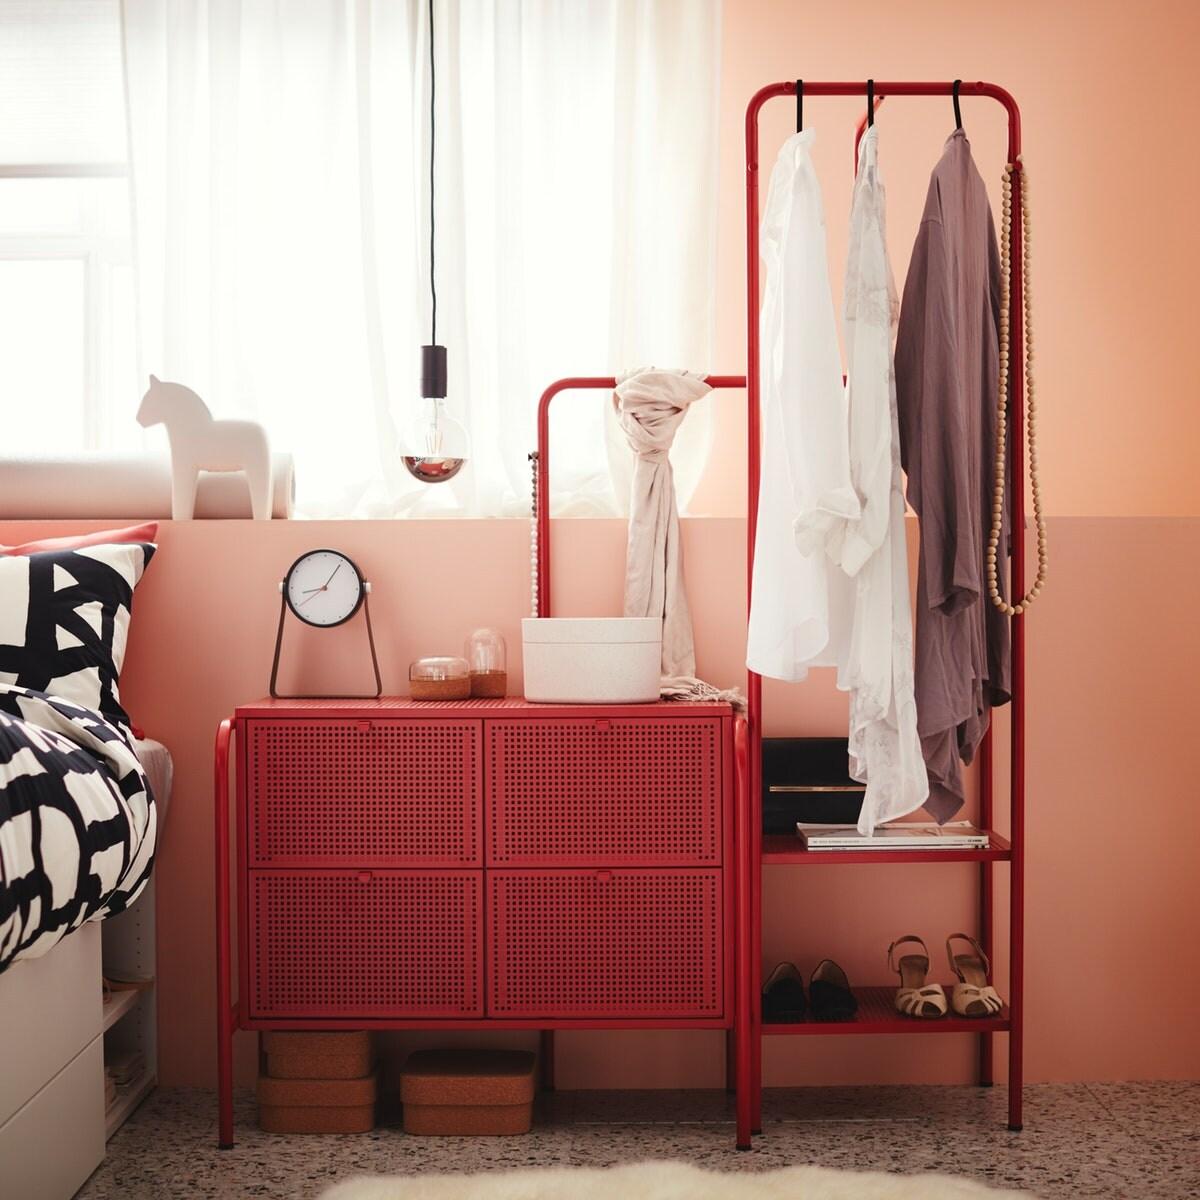 A red storage unit